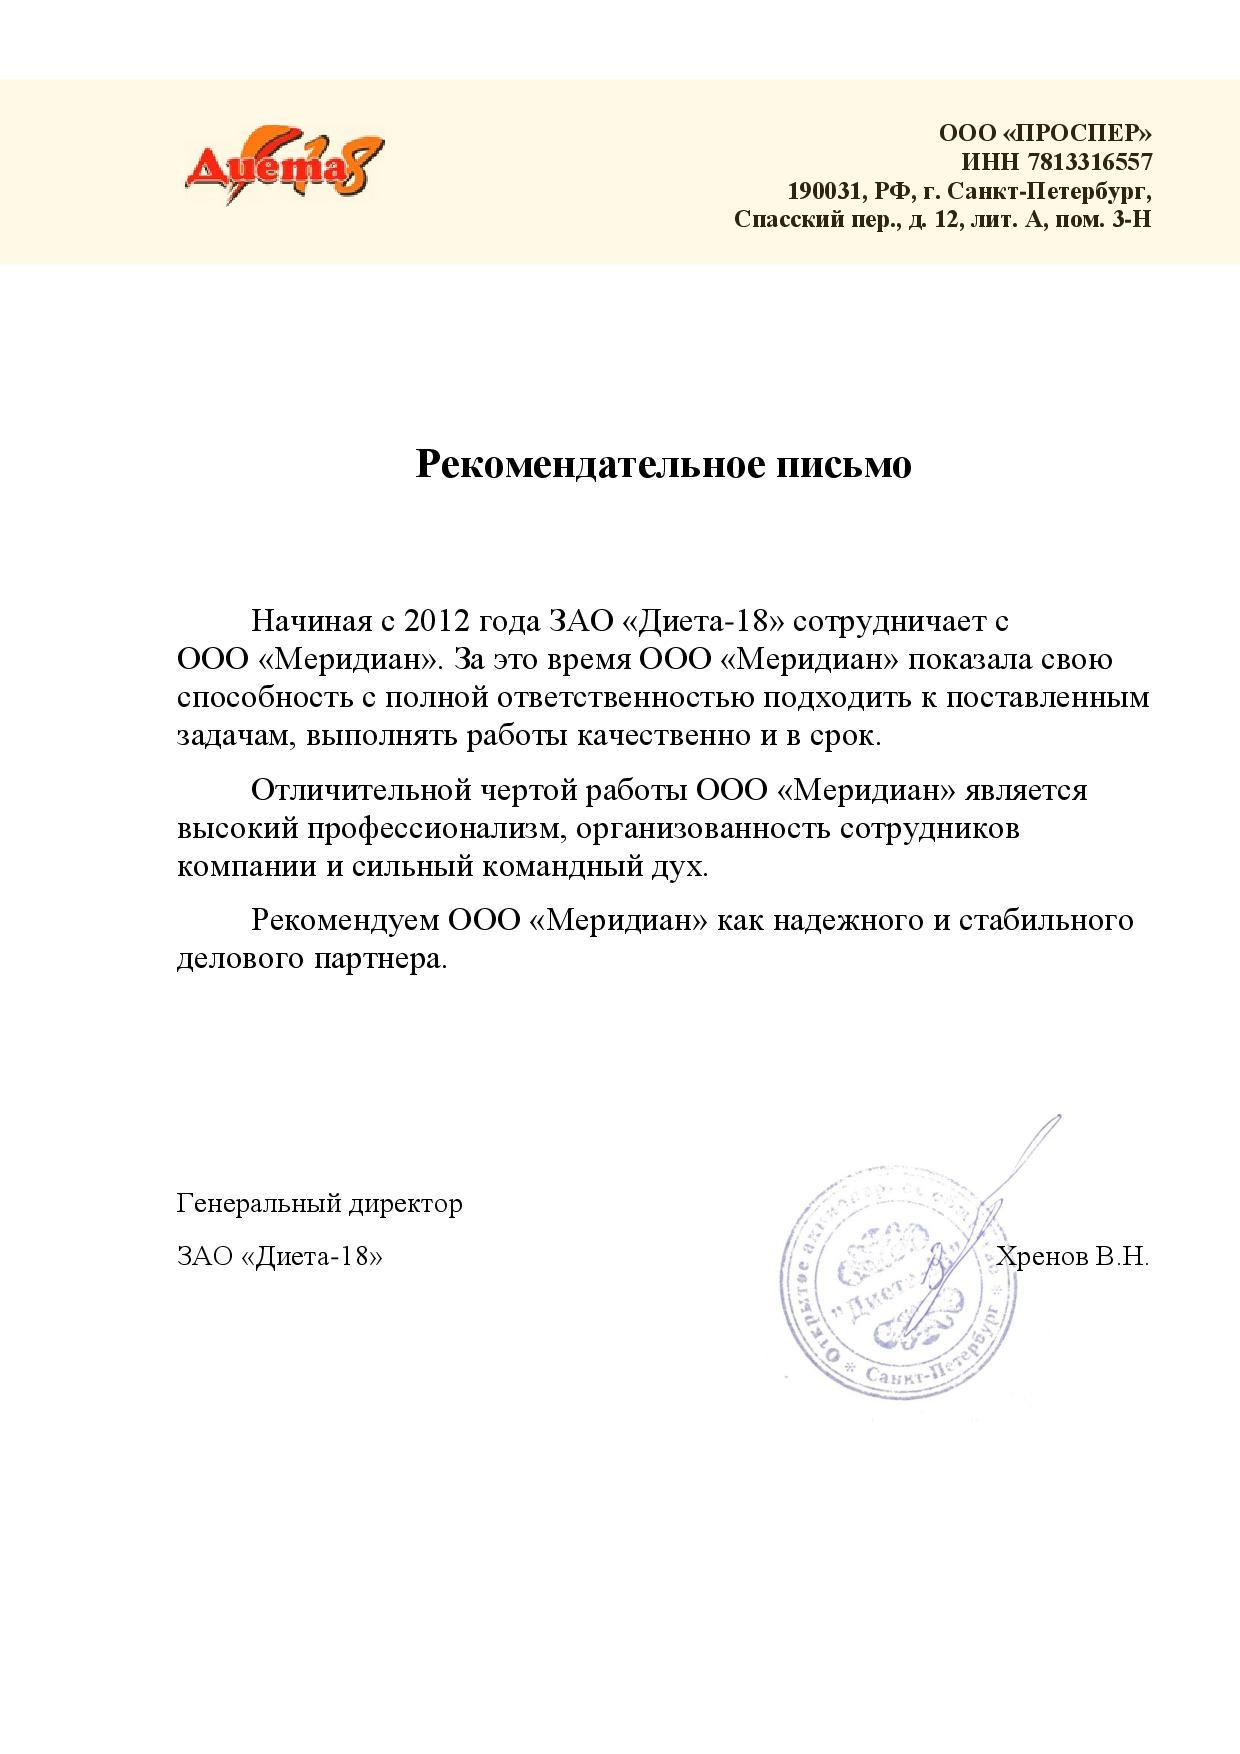 Photos at диета 18 (now closed) округ комендантский аэродром.